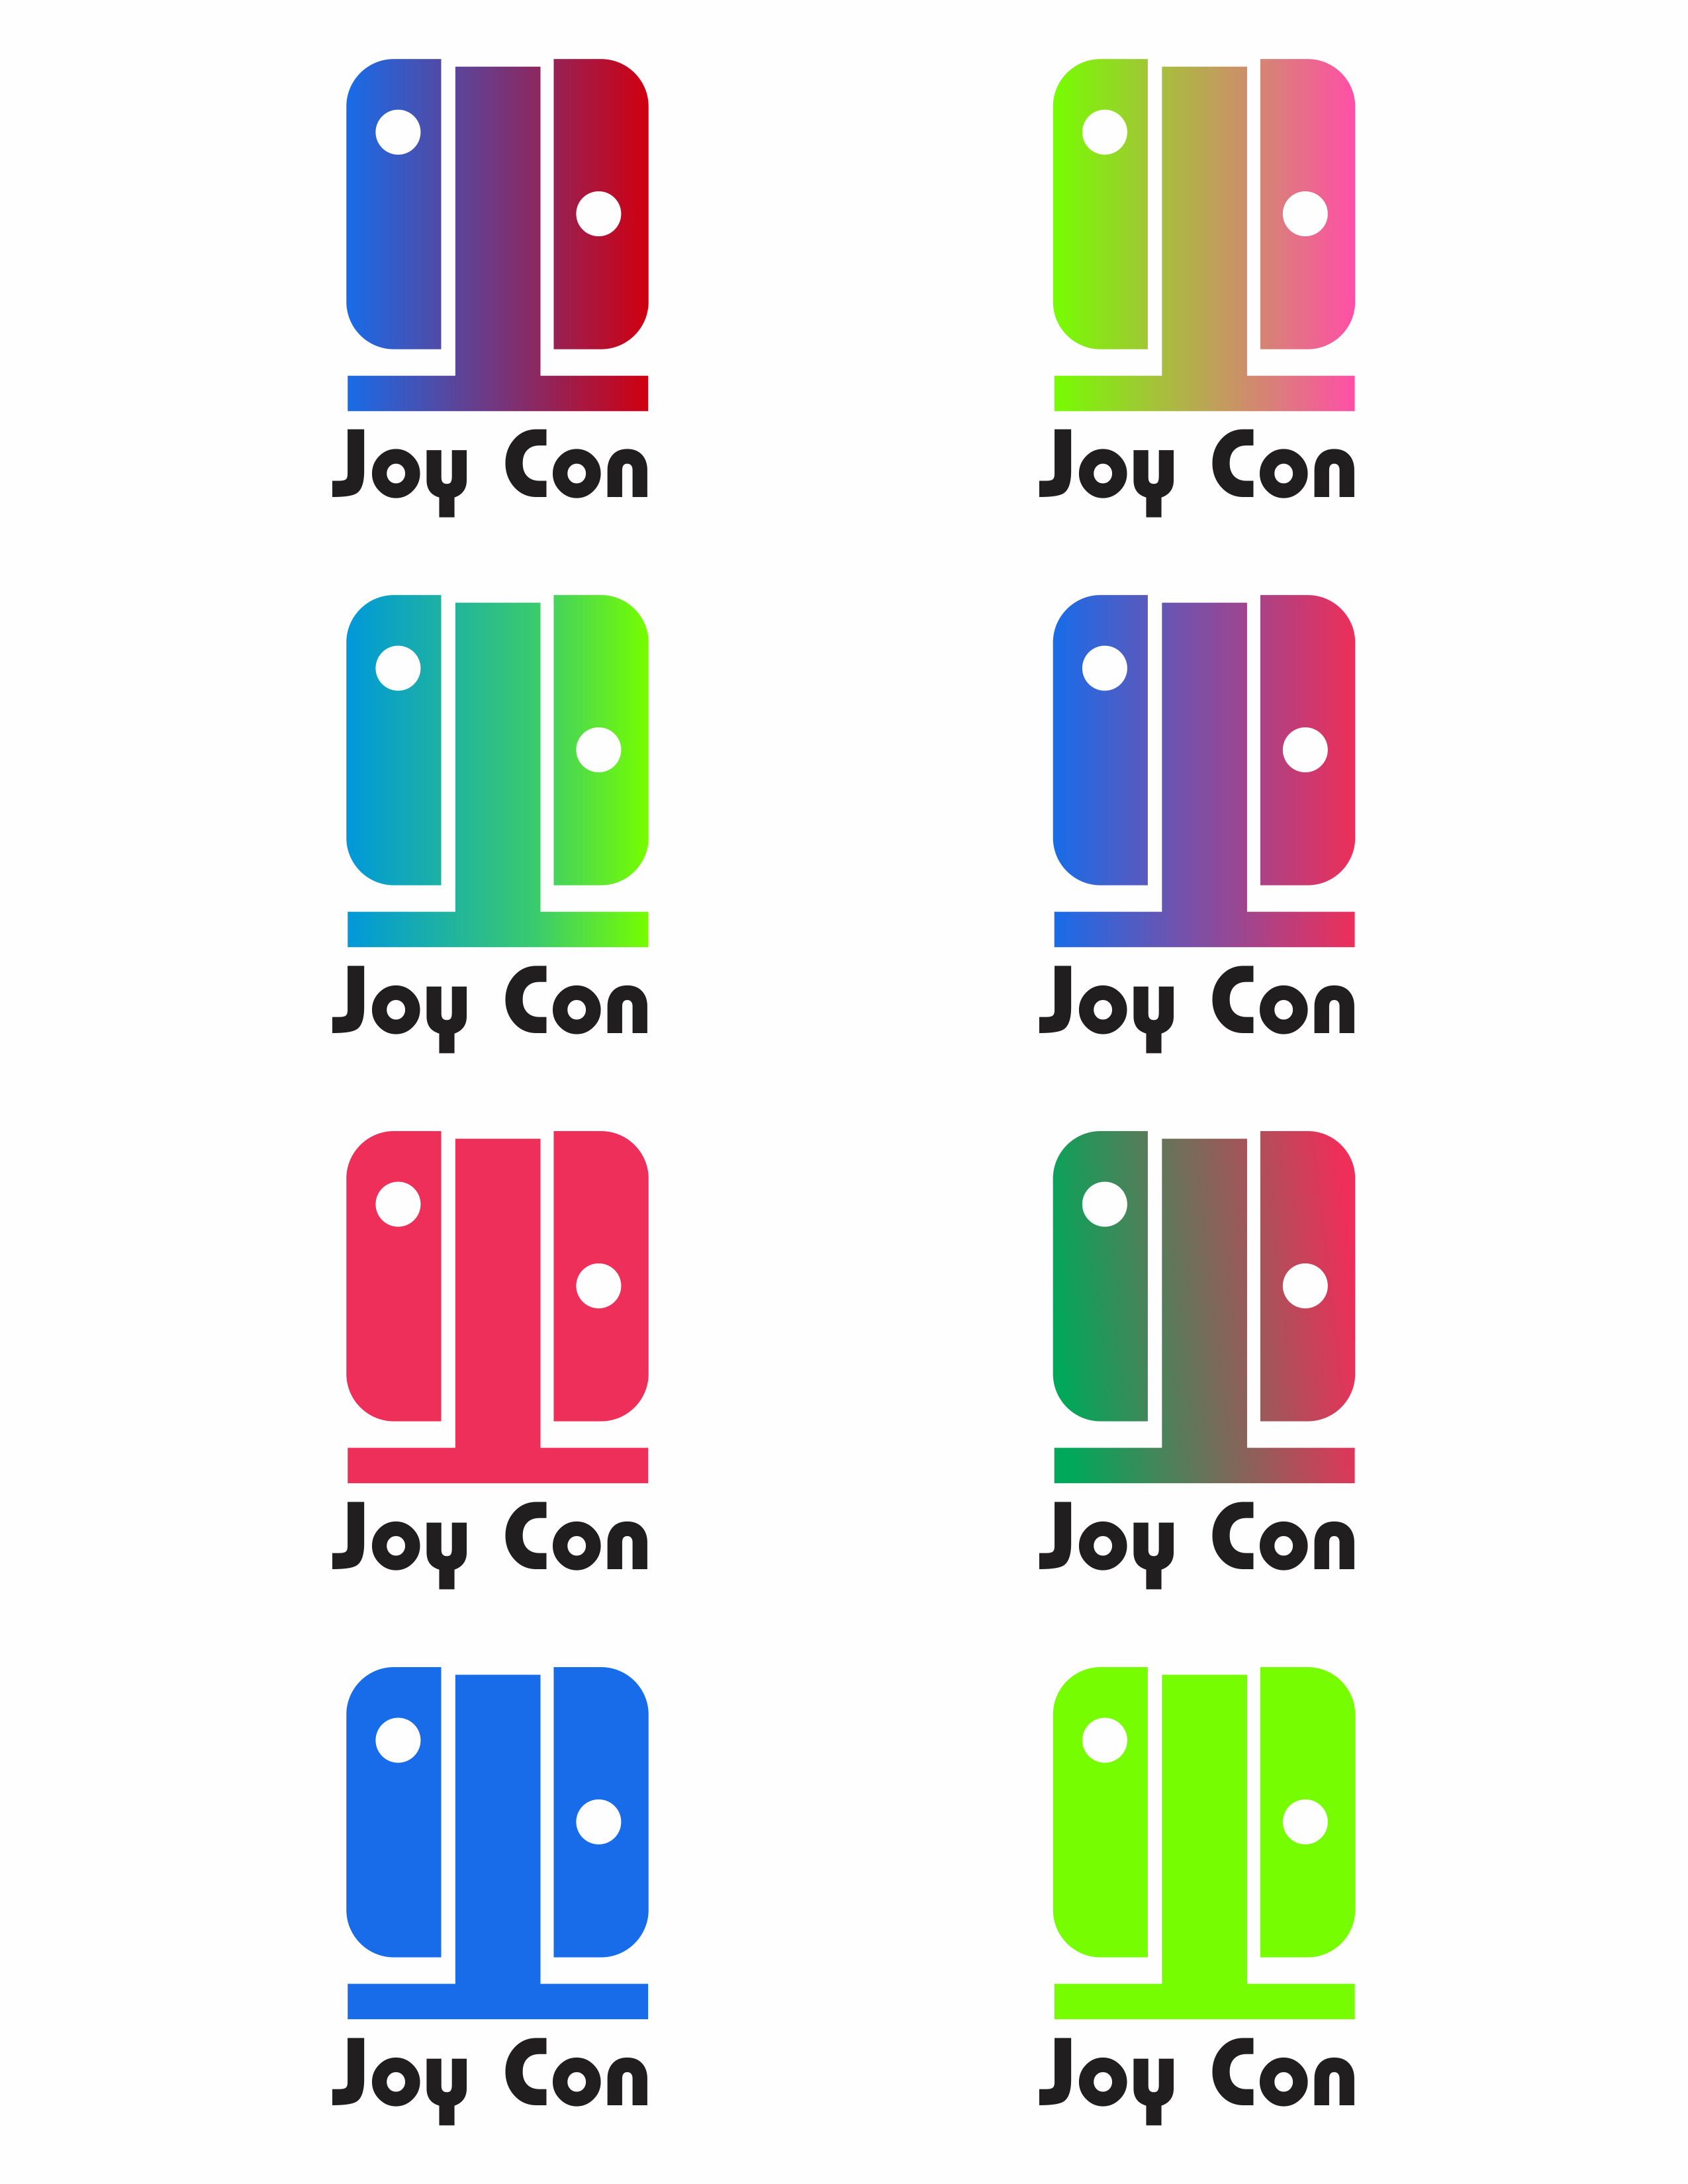 Logo Proporsal · Issue #91 · fossephate/JoyCon-Driver · GitHub